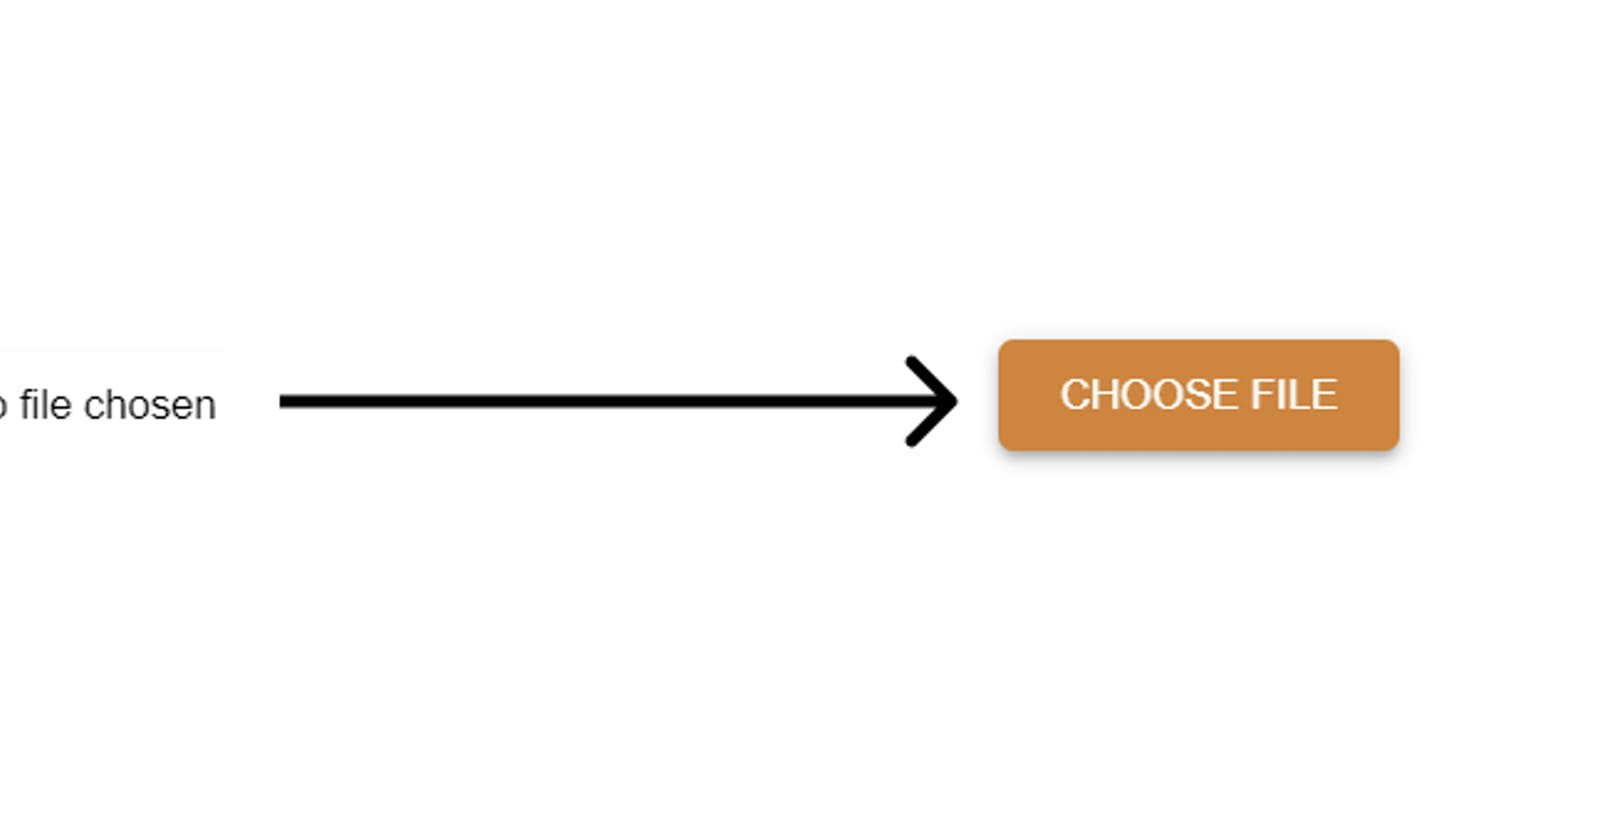 Custom file upload button